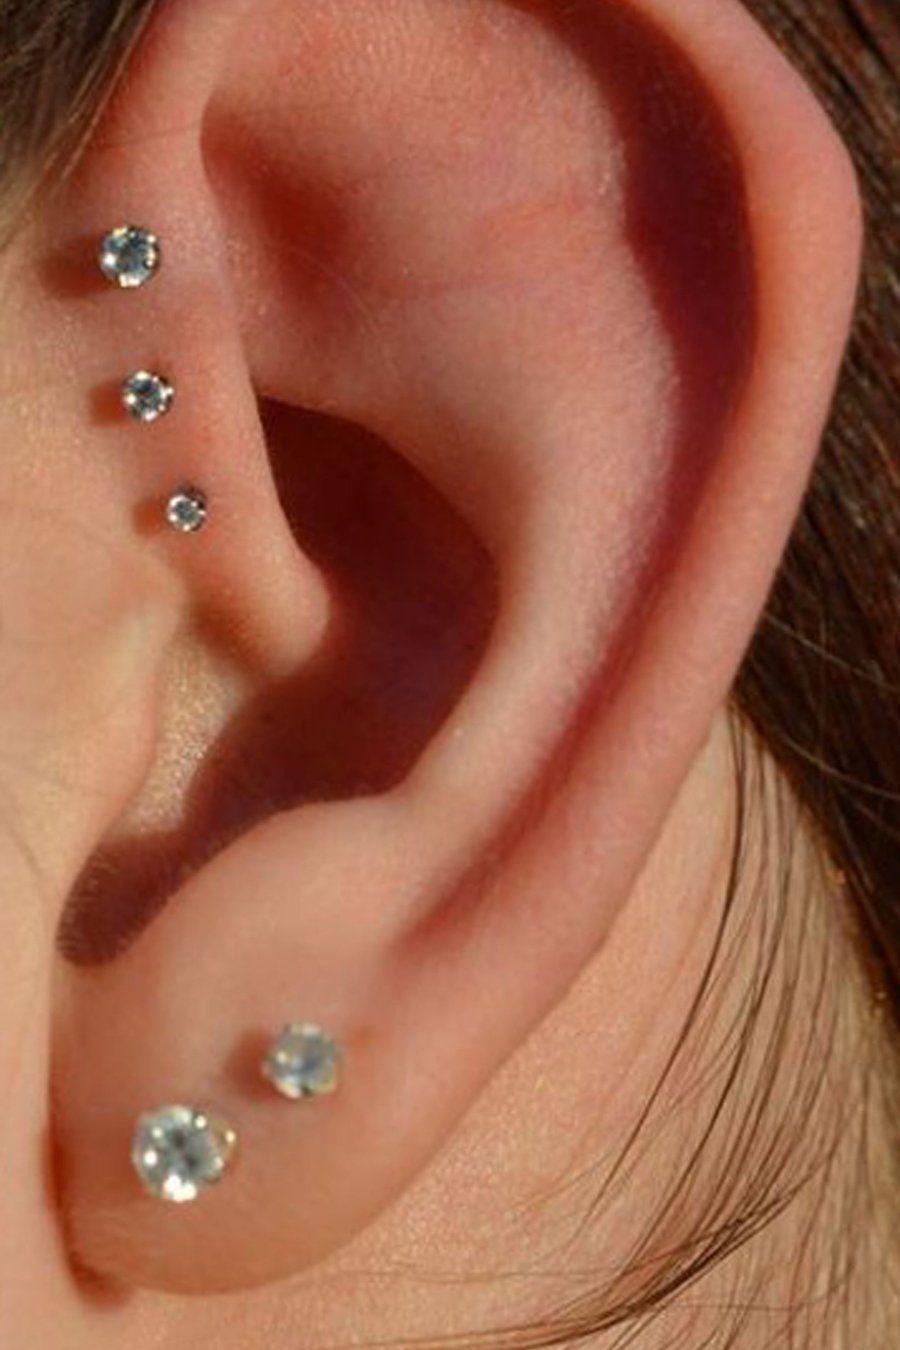 Triple Forward Cartilage Tragus Helix 16g Stud Earring Jewelry Piercing Vintage